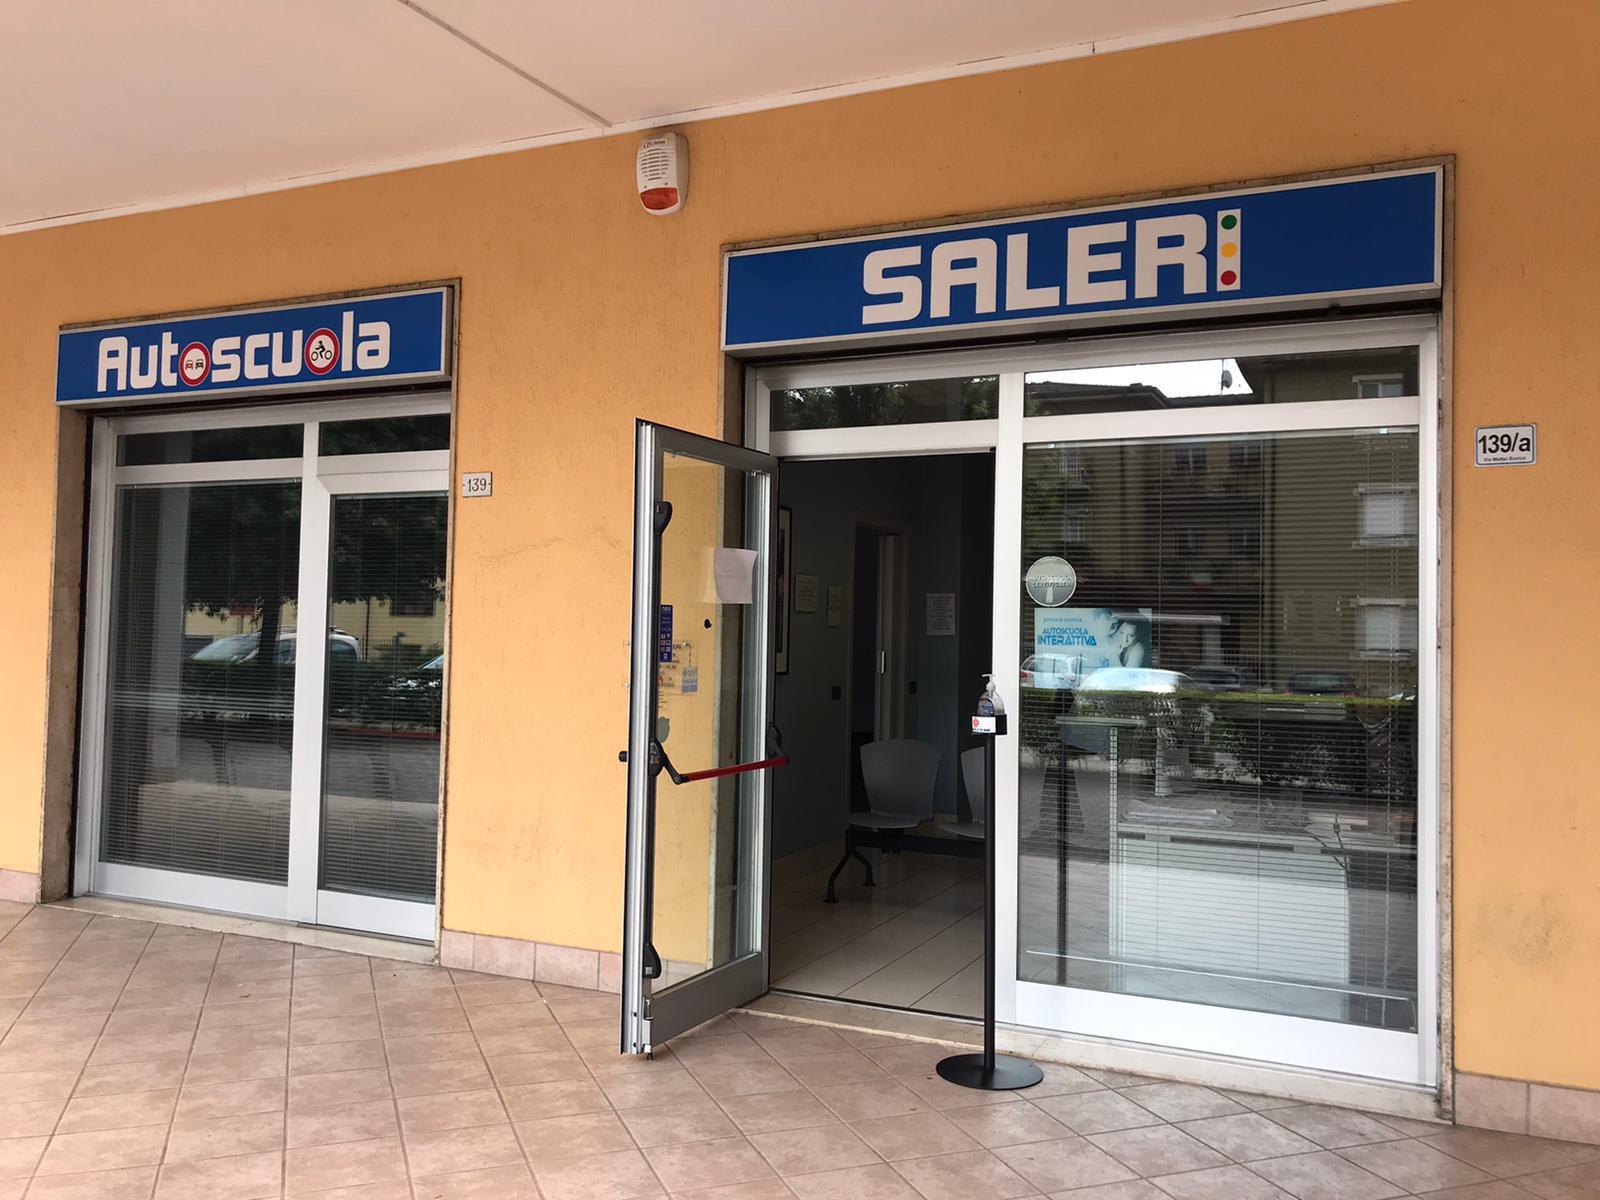 Autoscuola Saleri - Sede di Concesio in via Mattei